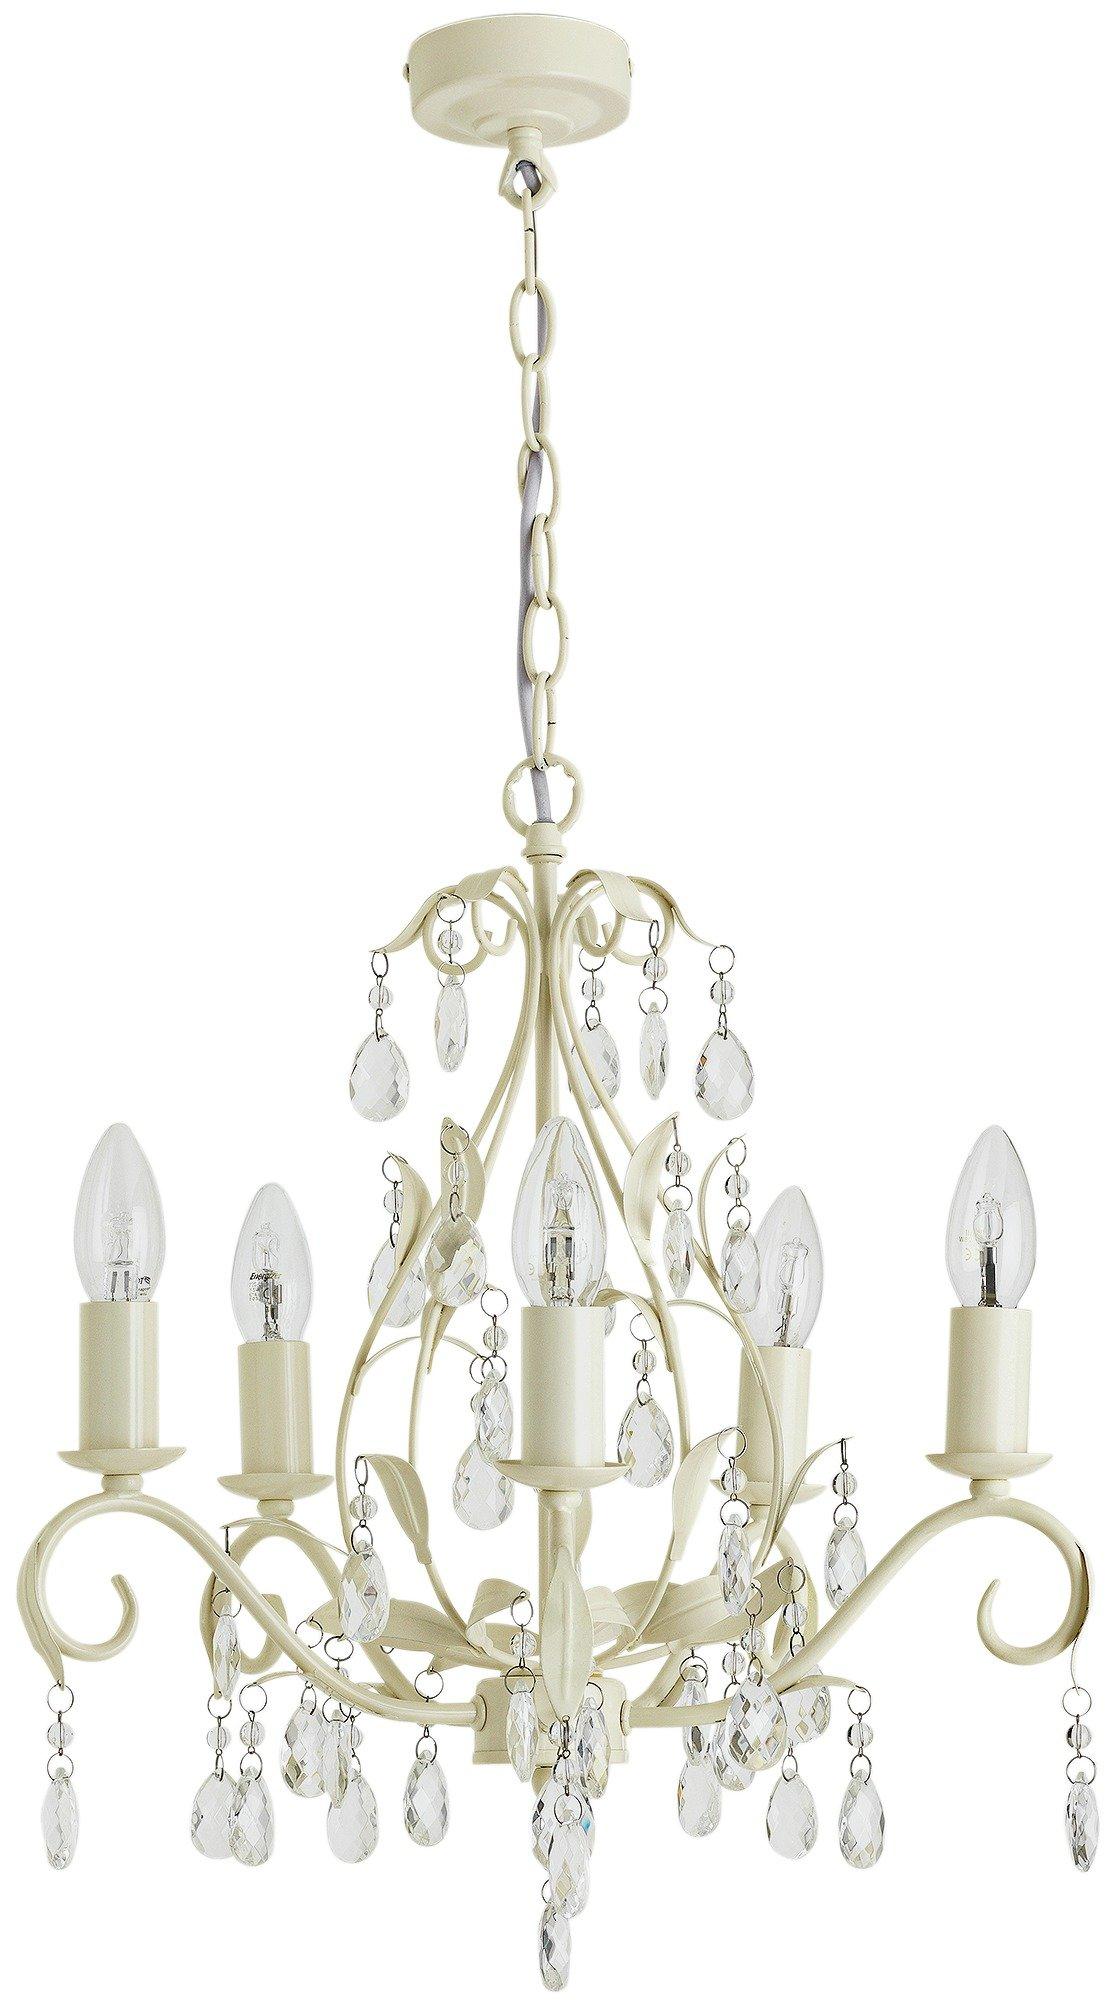 lighting page 7 argos price tracker. Black Bedroom Furniture Sets. Home Design Ideas